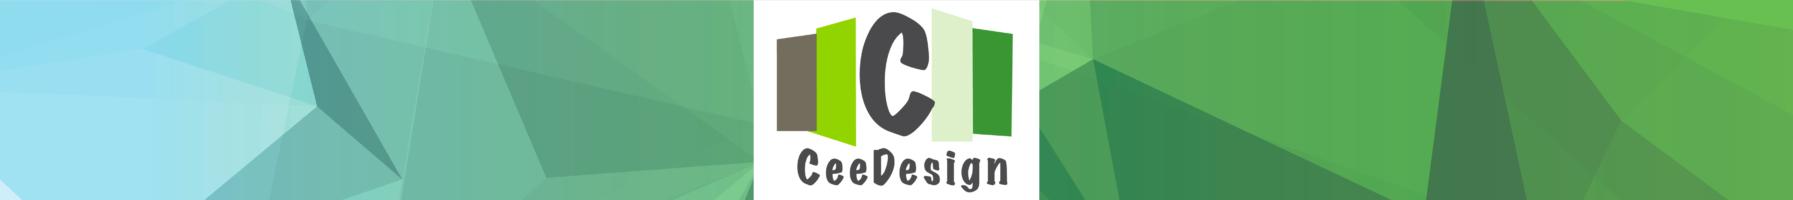 CeeDesign